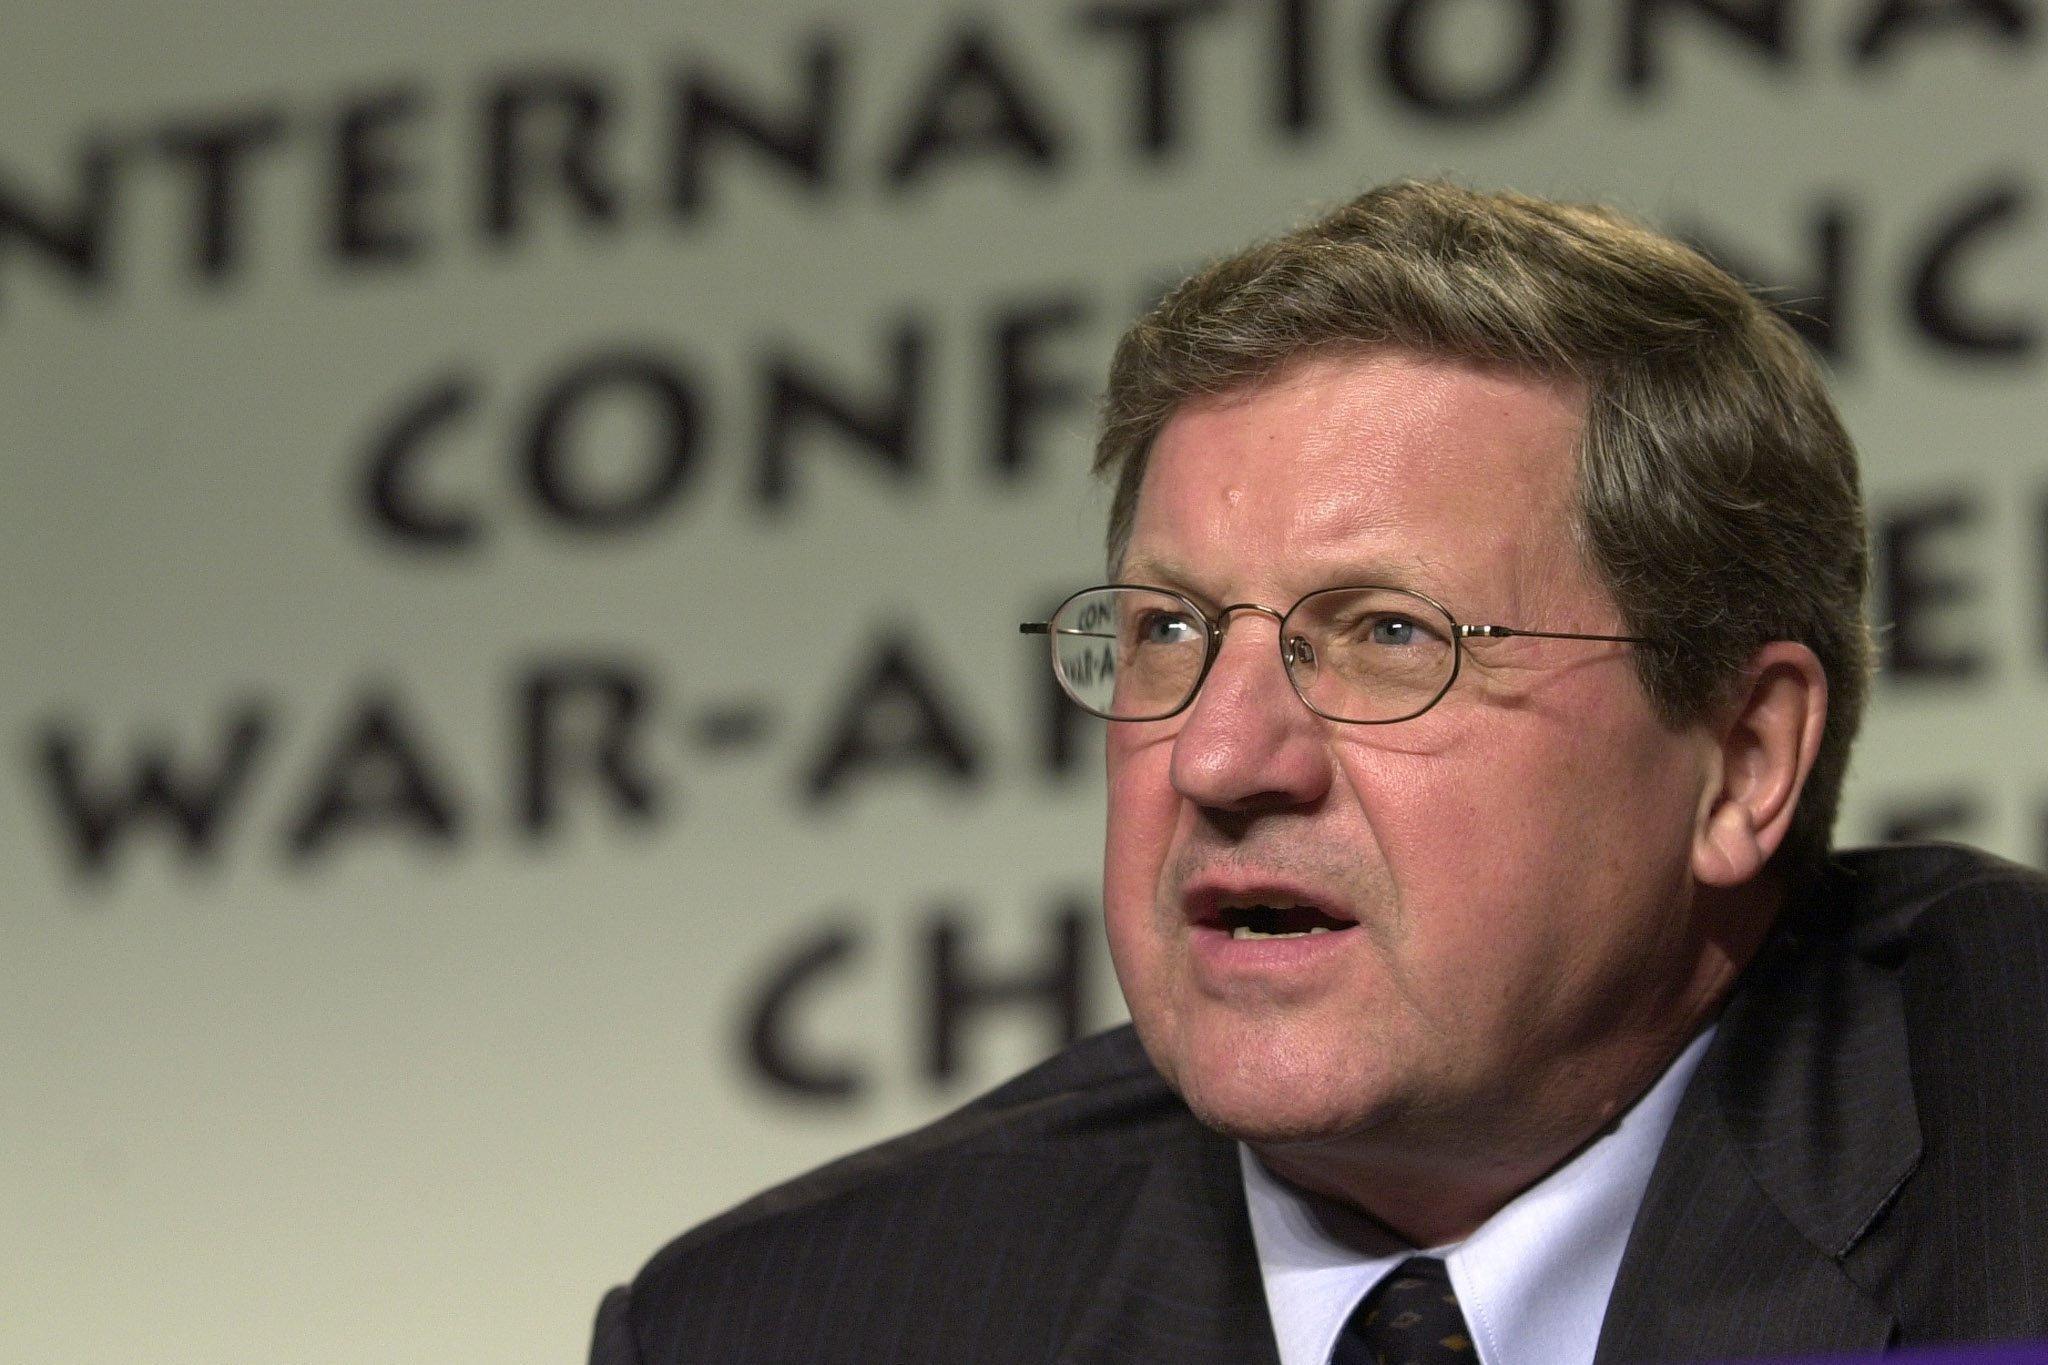 Axworthy در سال 2000 در کنفرانس بین المللی کودکان مبتلا به جنگ در وینیپگ (فرد گرینسلید / CP)